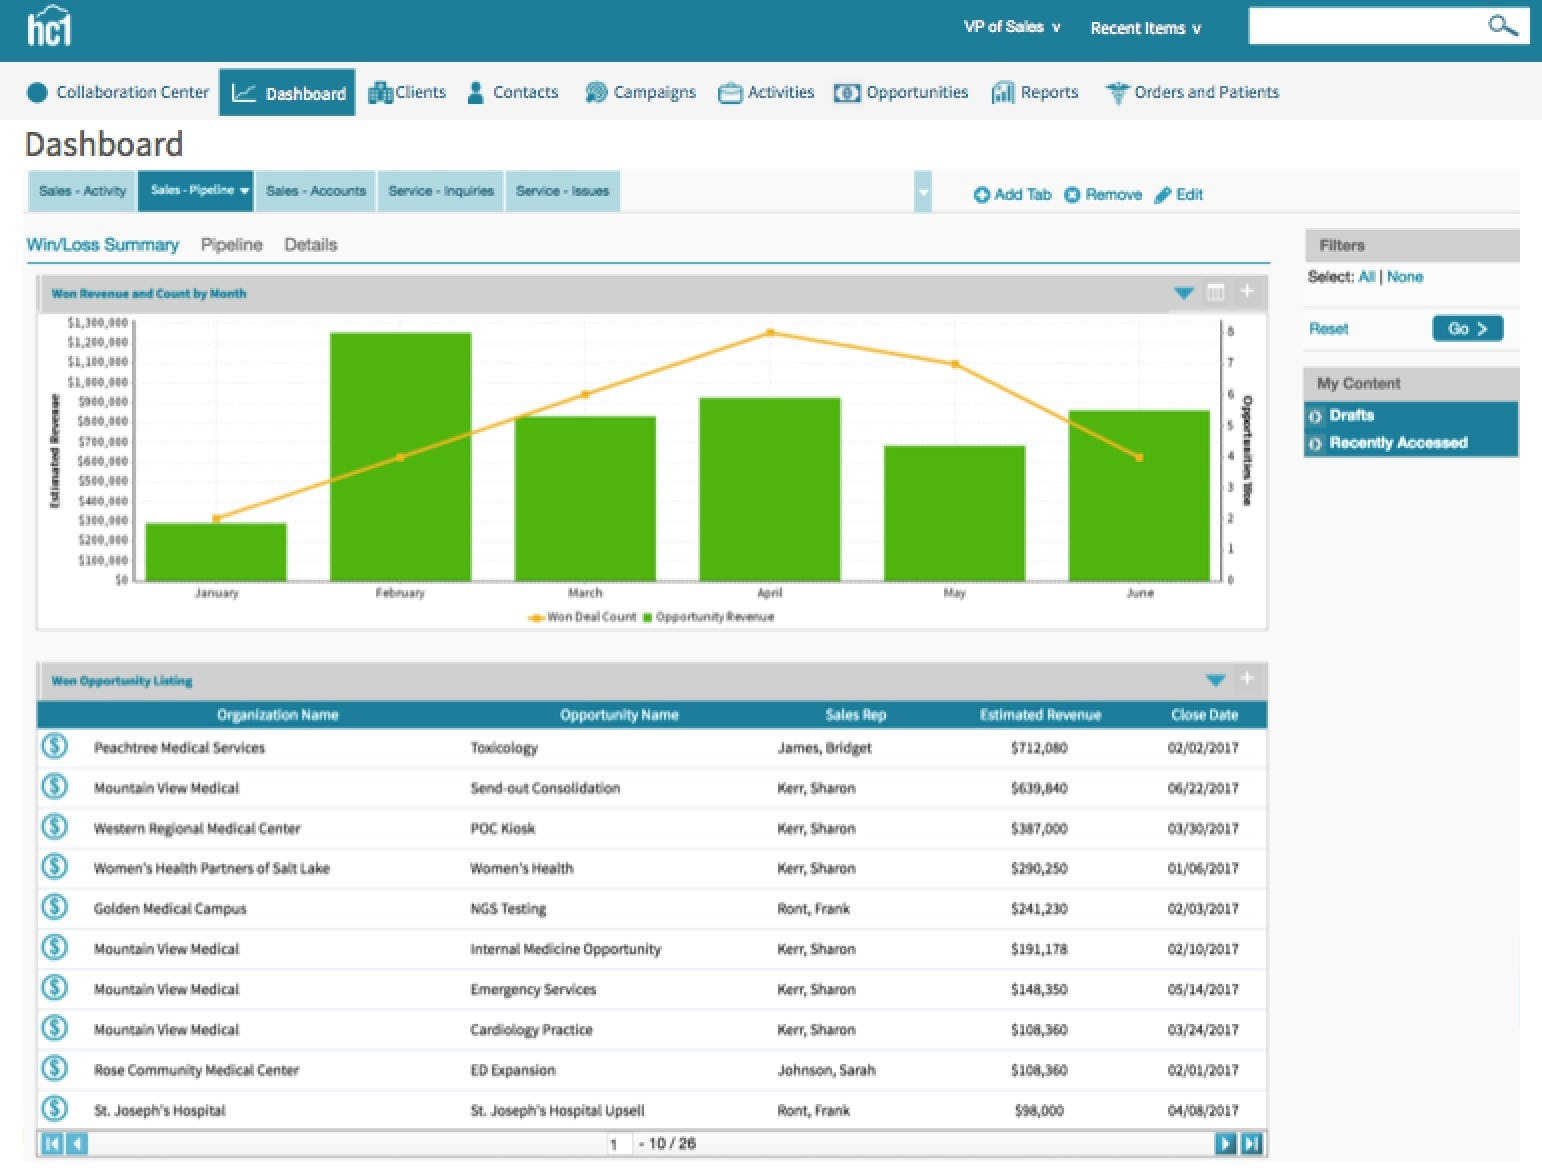 hc1 High-Value Care Platform Software - Sales pipeline - month over month %>